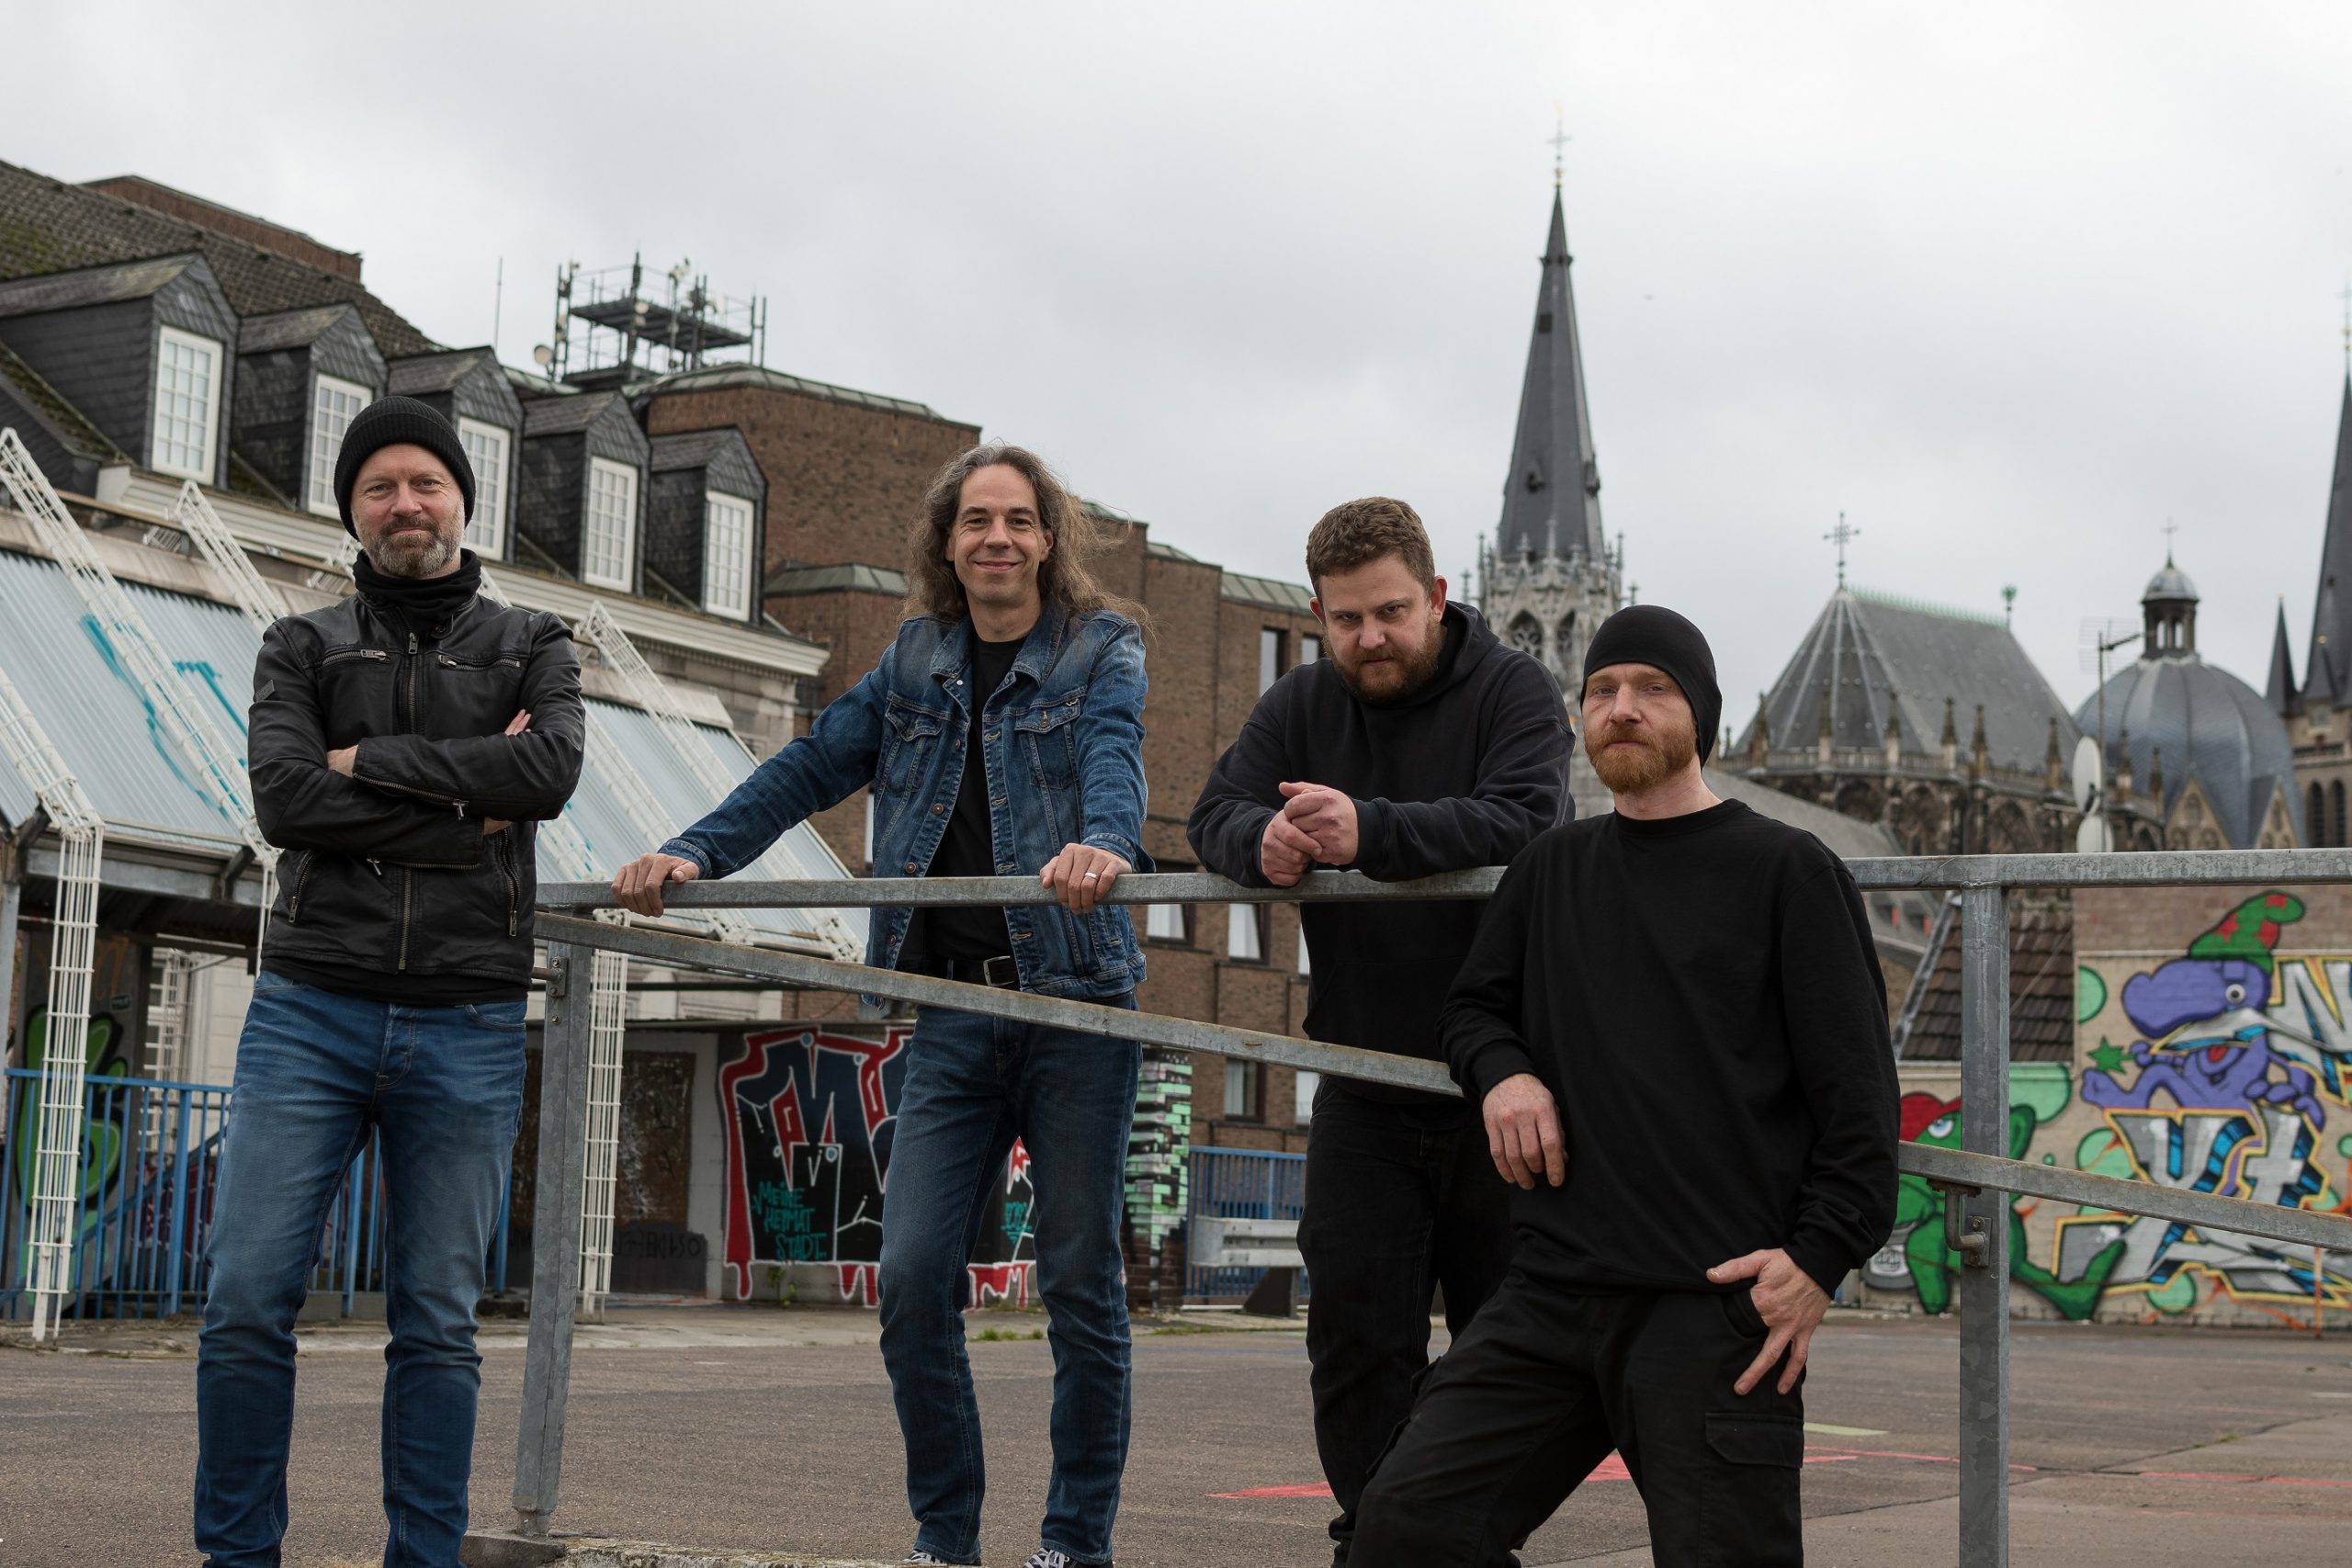 johnny-rocky-and-the-weekend-warriors-die-kuerzeste-band-deutschlands